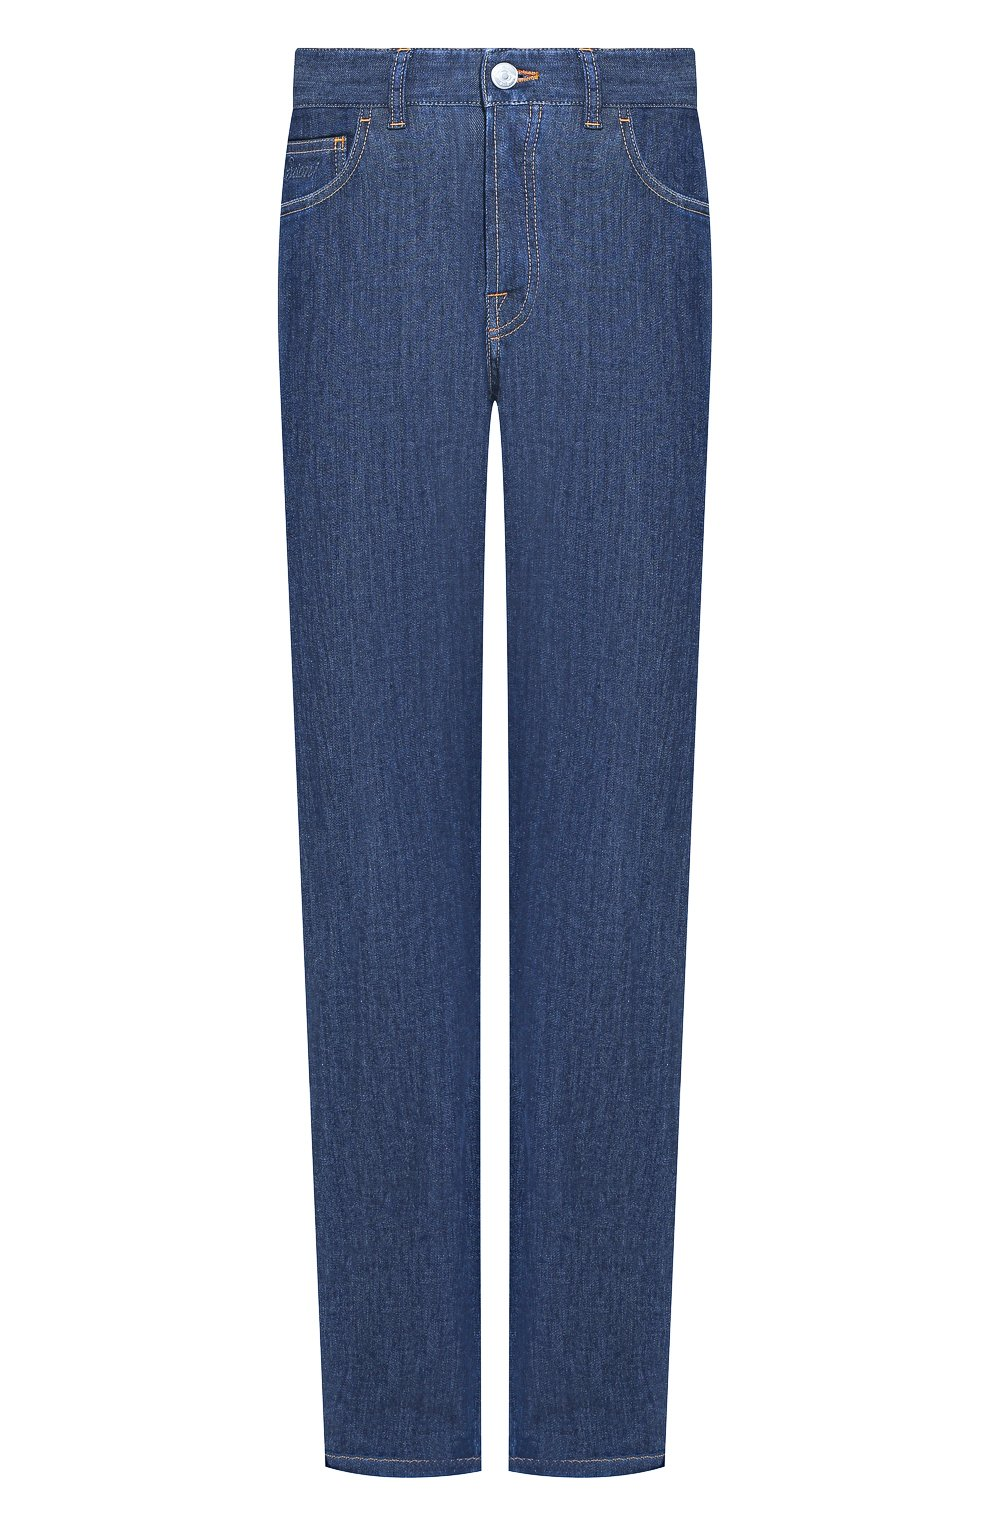 Мужские джинсы BRIONI голубого цвета, арт. SPNJ0L/P9D22/STELVI0 | Фото 1